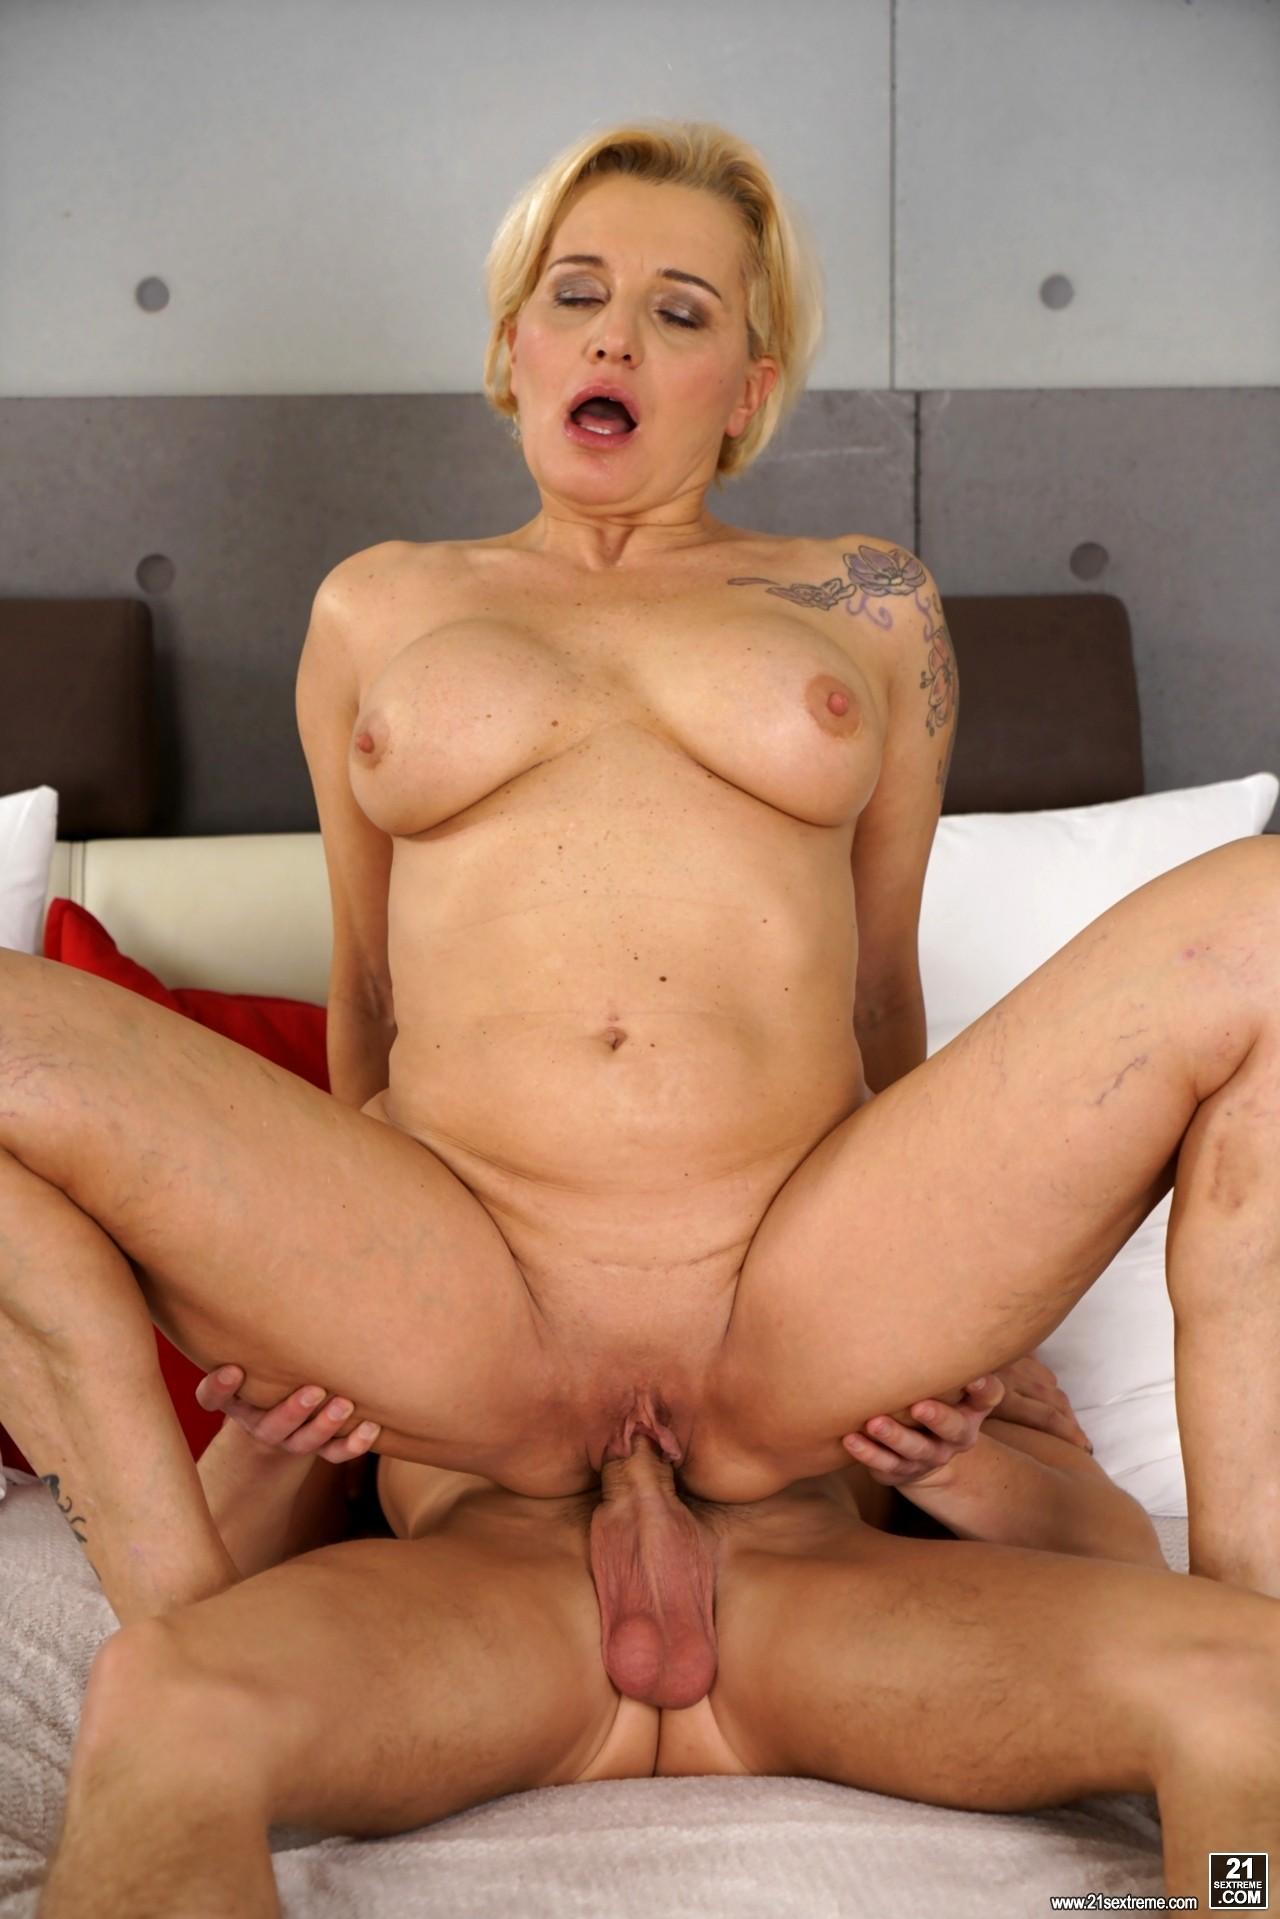 Babe Today 21 Sextury Maria Jamma Unexpected Granny Hdtv -5983